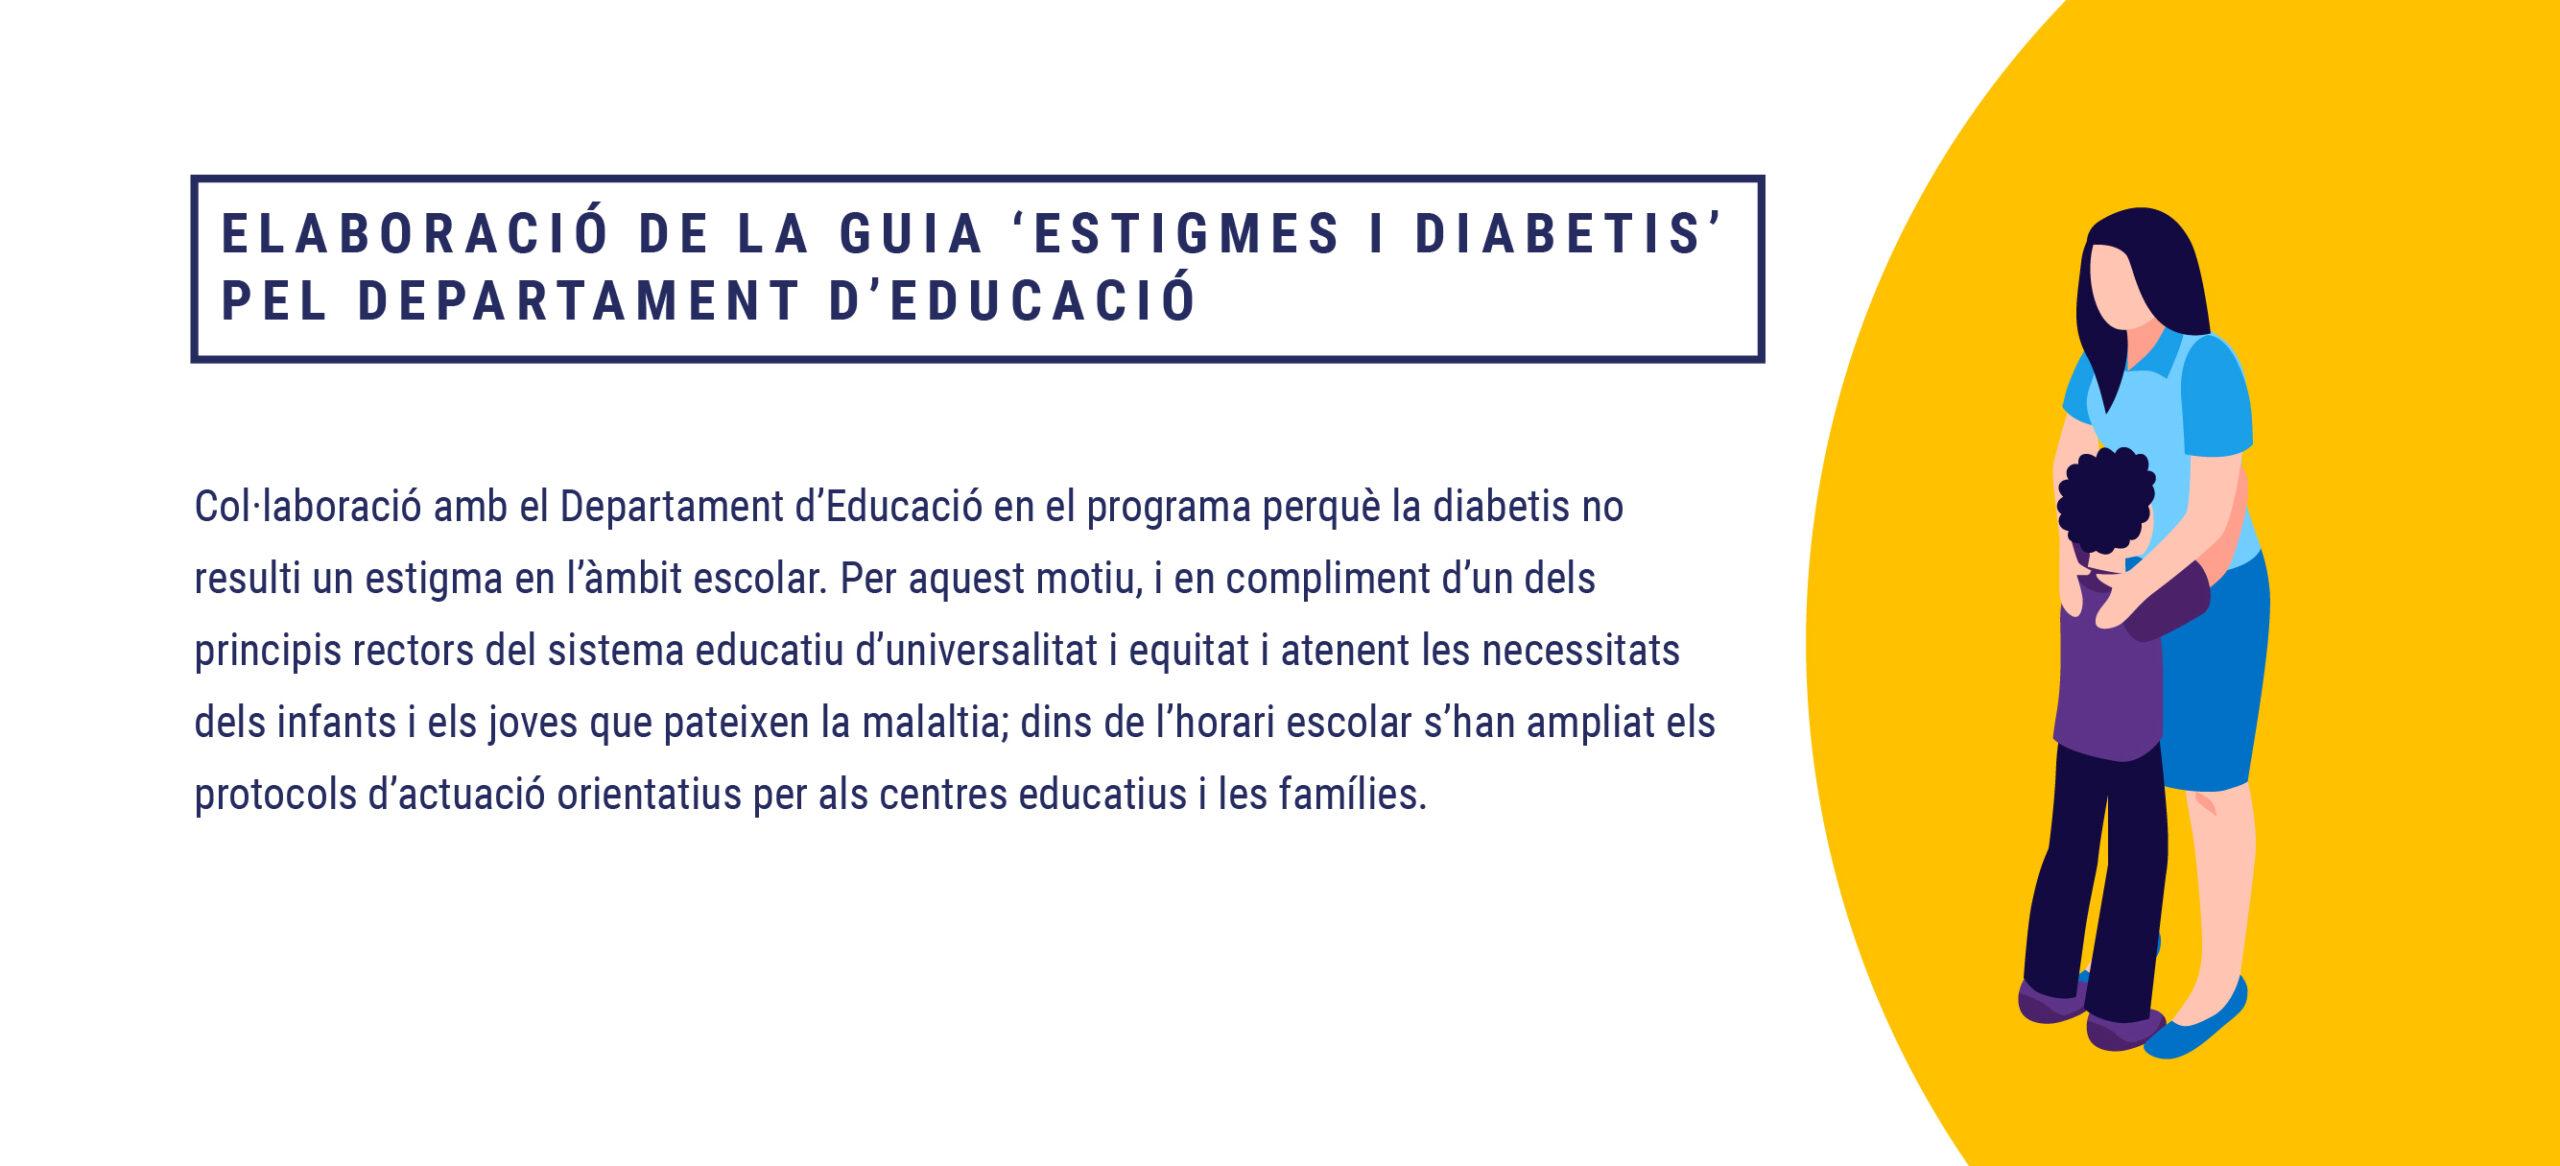 Guia estigmes i diabetis